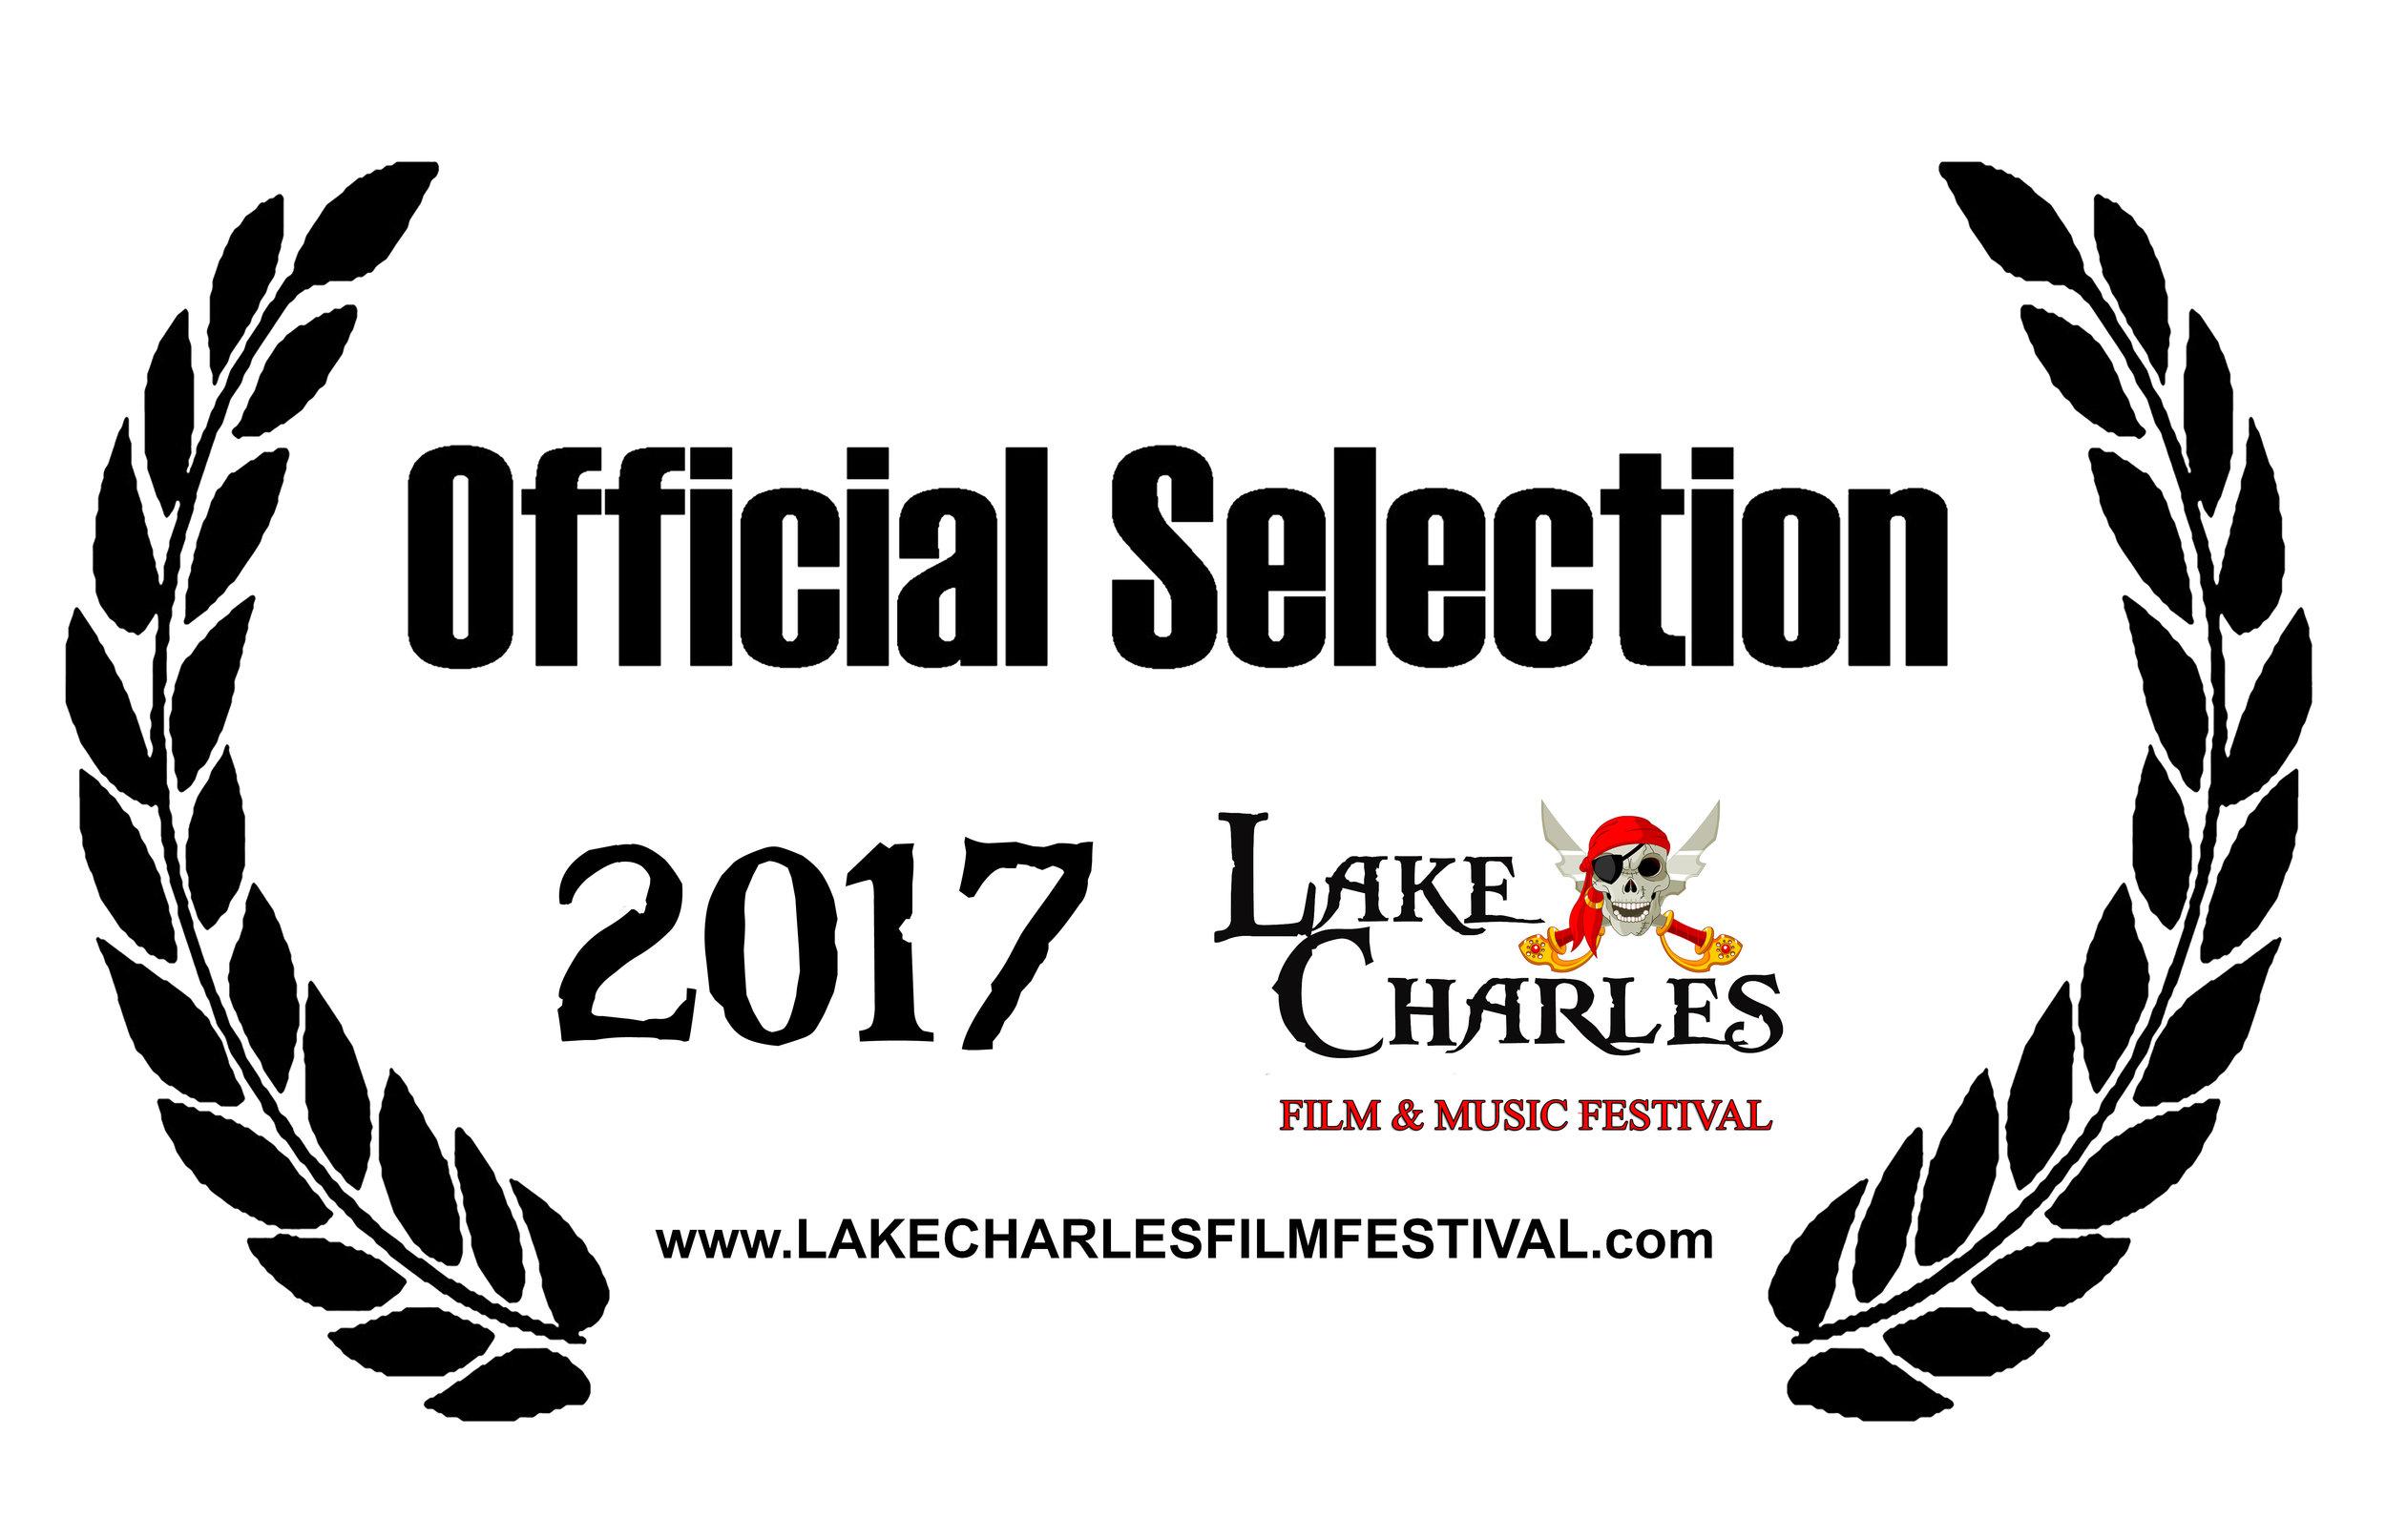 2017_OFFICIAL_SELECTION_LAURELS.jpg